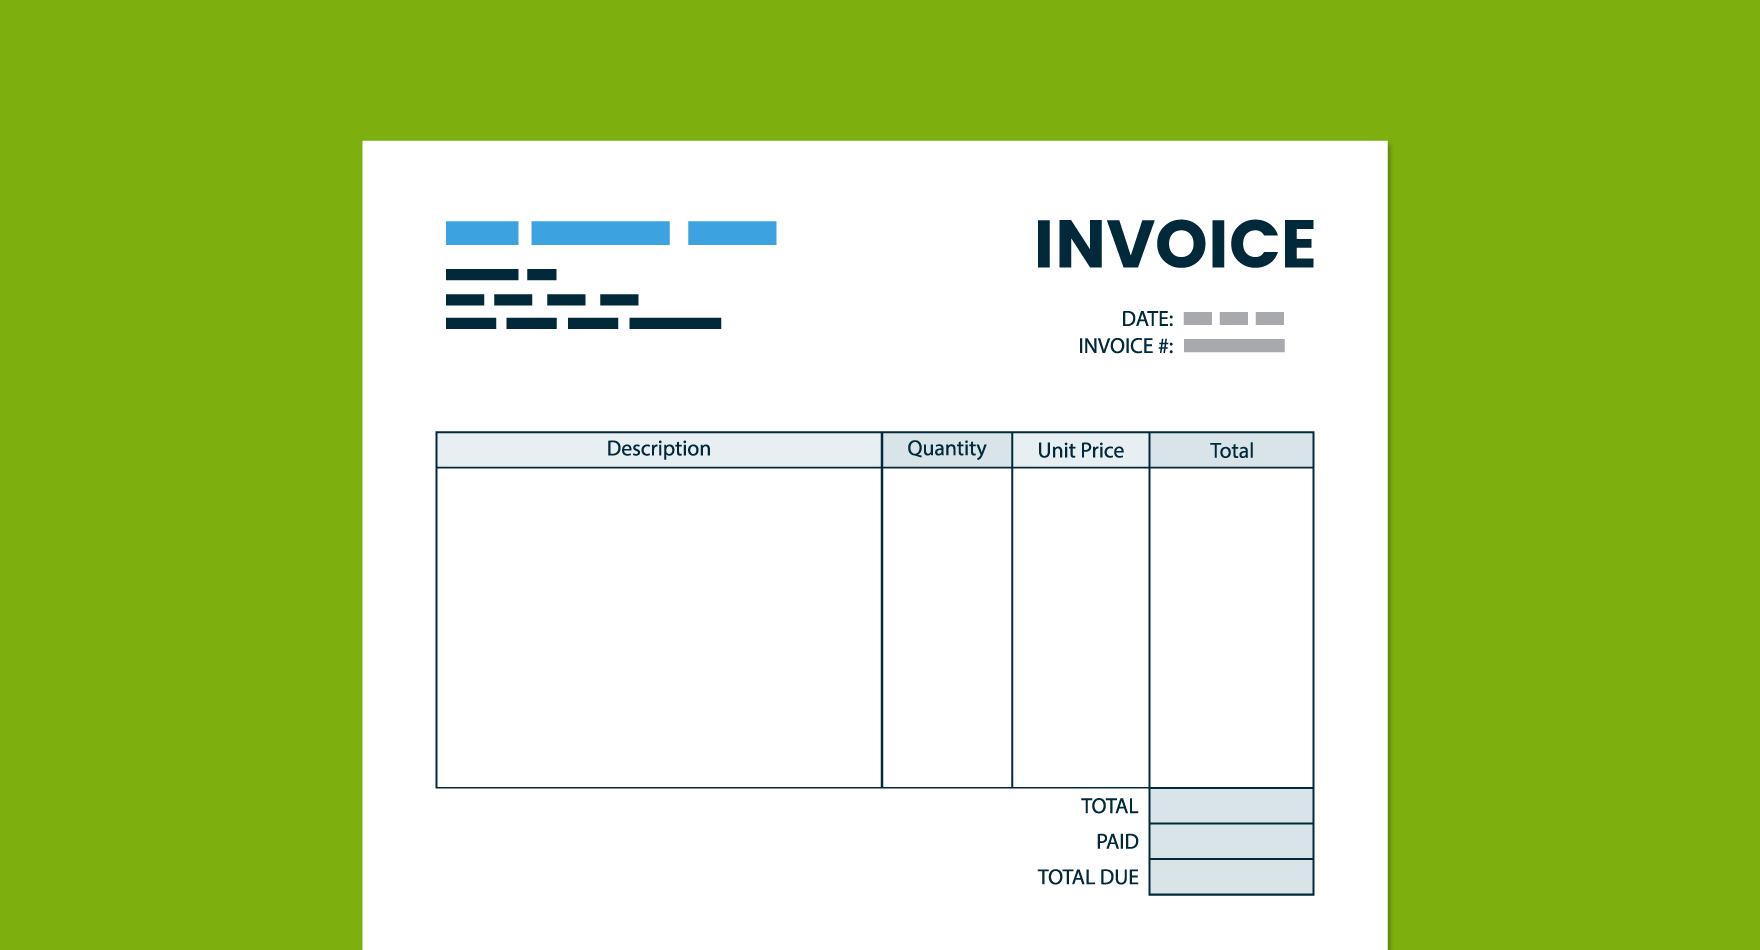 Invoice Template Quickbooks Free Attending Invoice Template Quickbooks Free Can Be A Disaste Invoice Template Invoice Template Word Business Proposal Letter